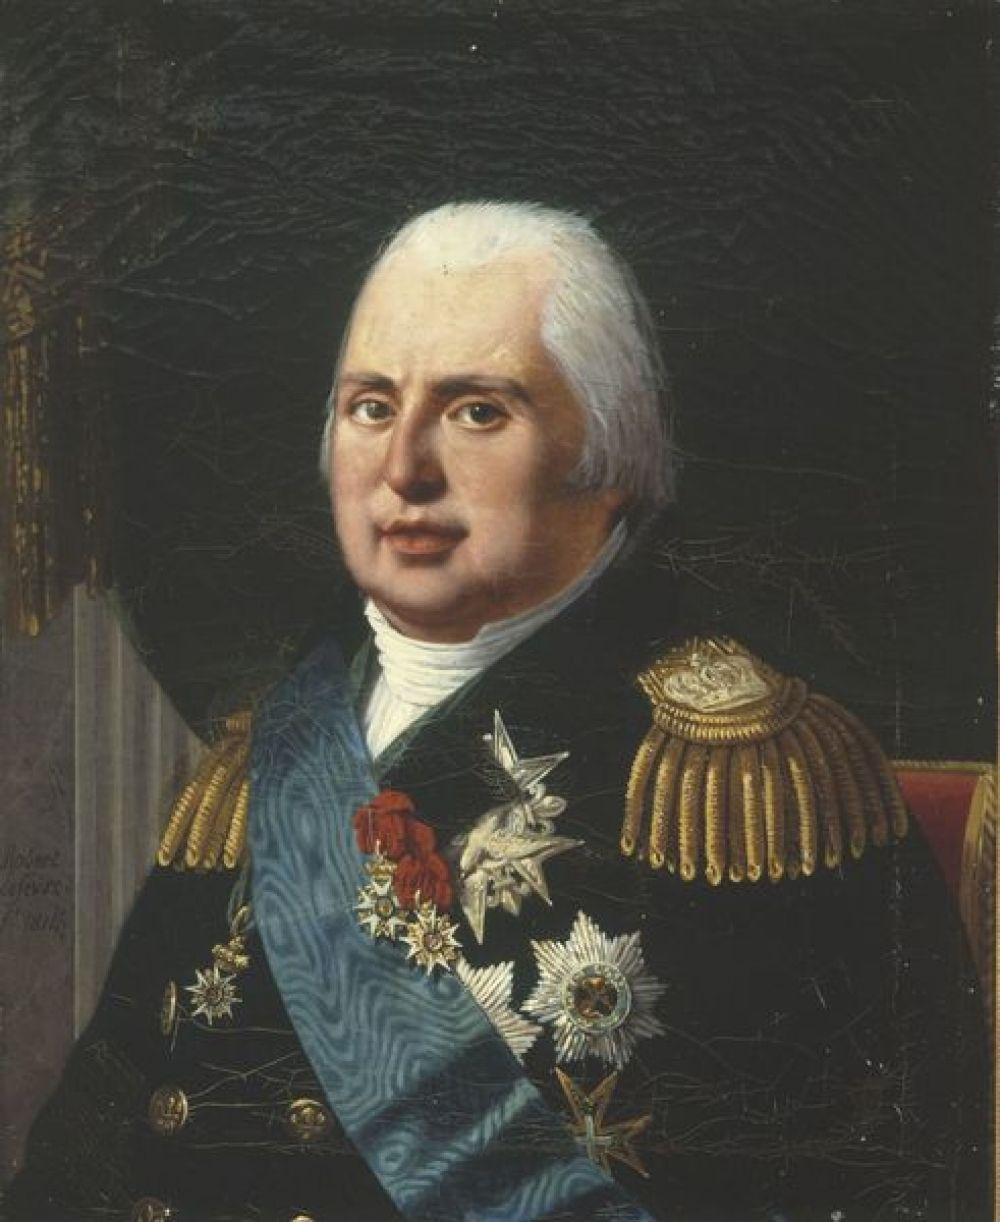 Portrait de Louis XVIII - Carnavalet